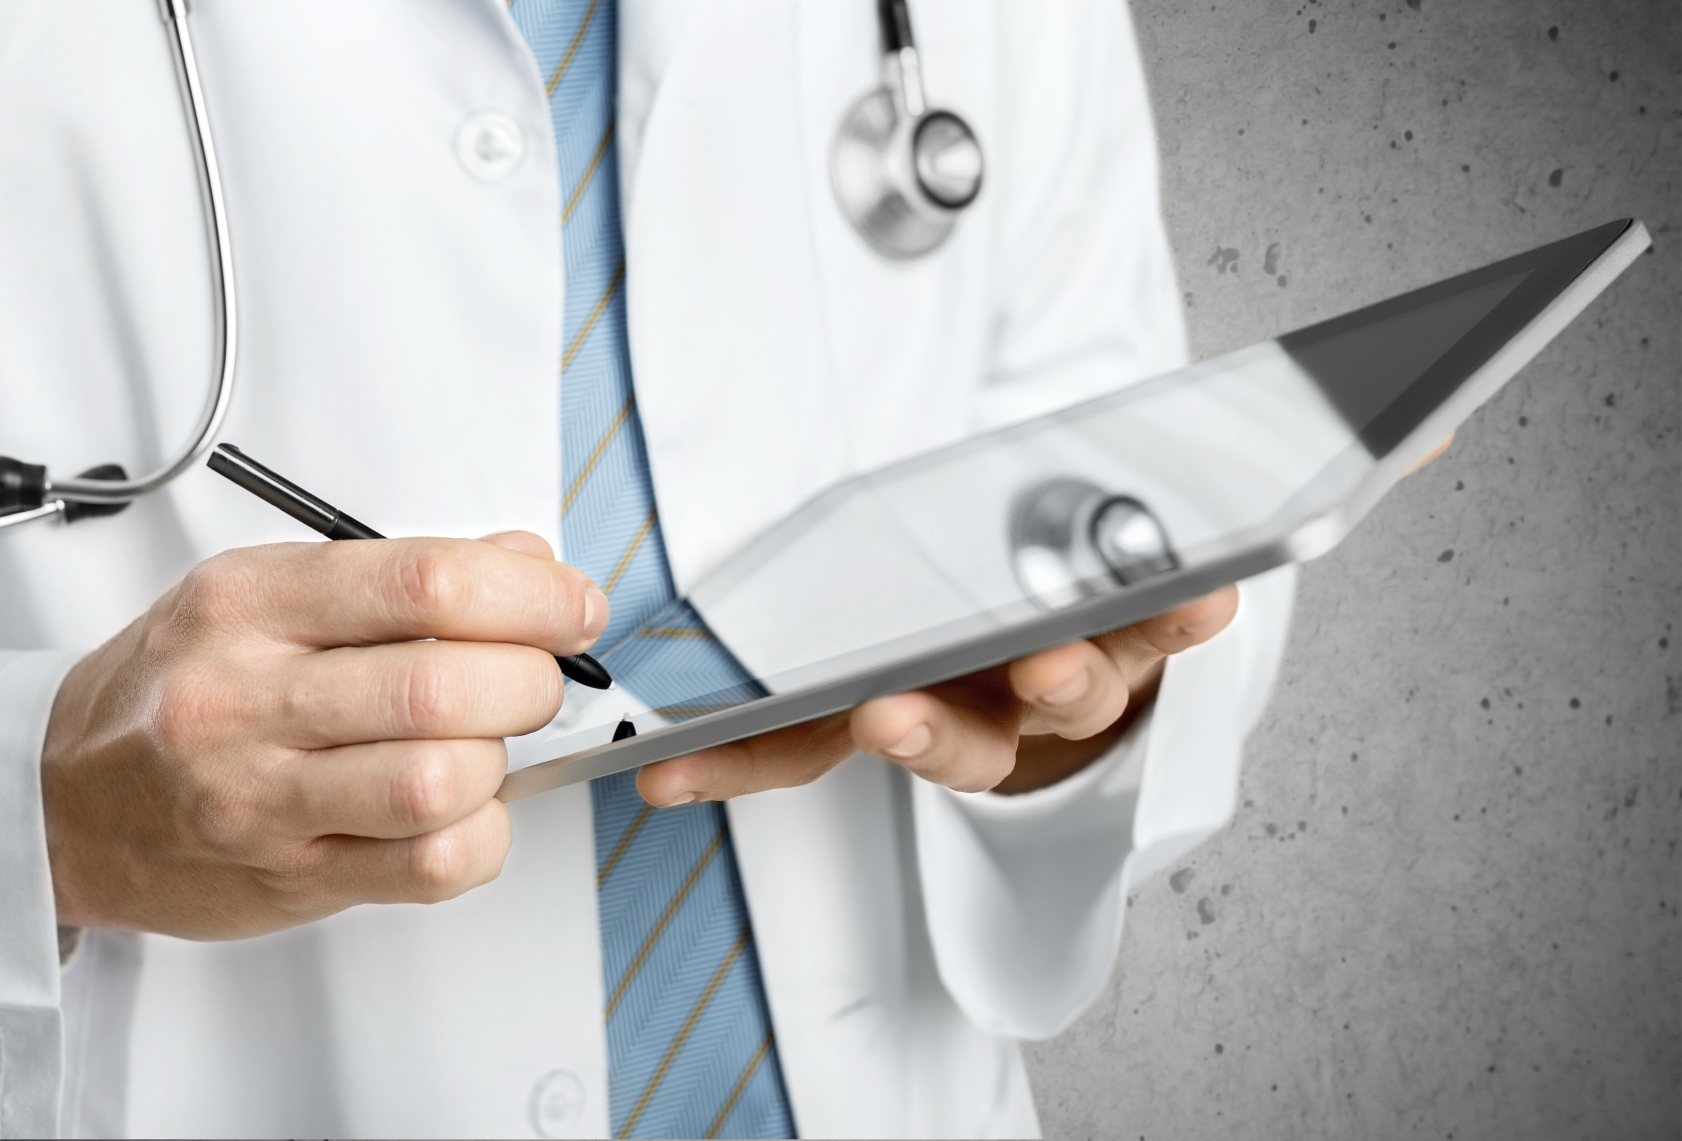 noticia medicina tecnologia